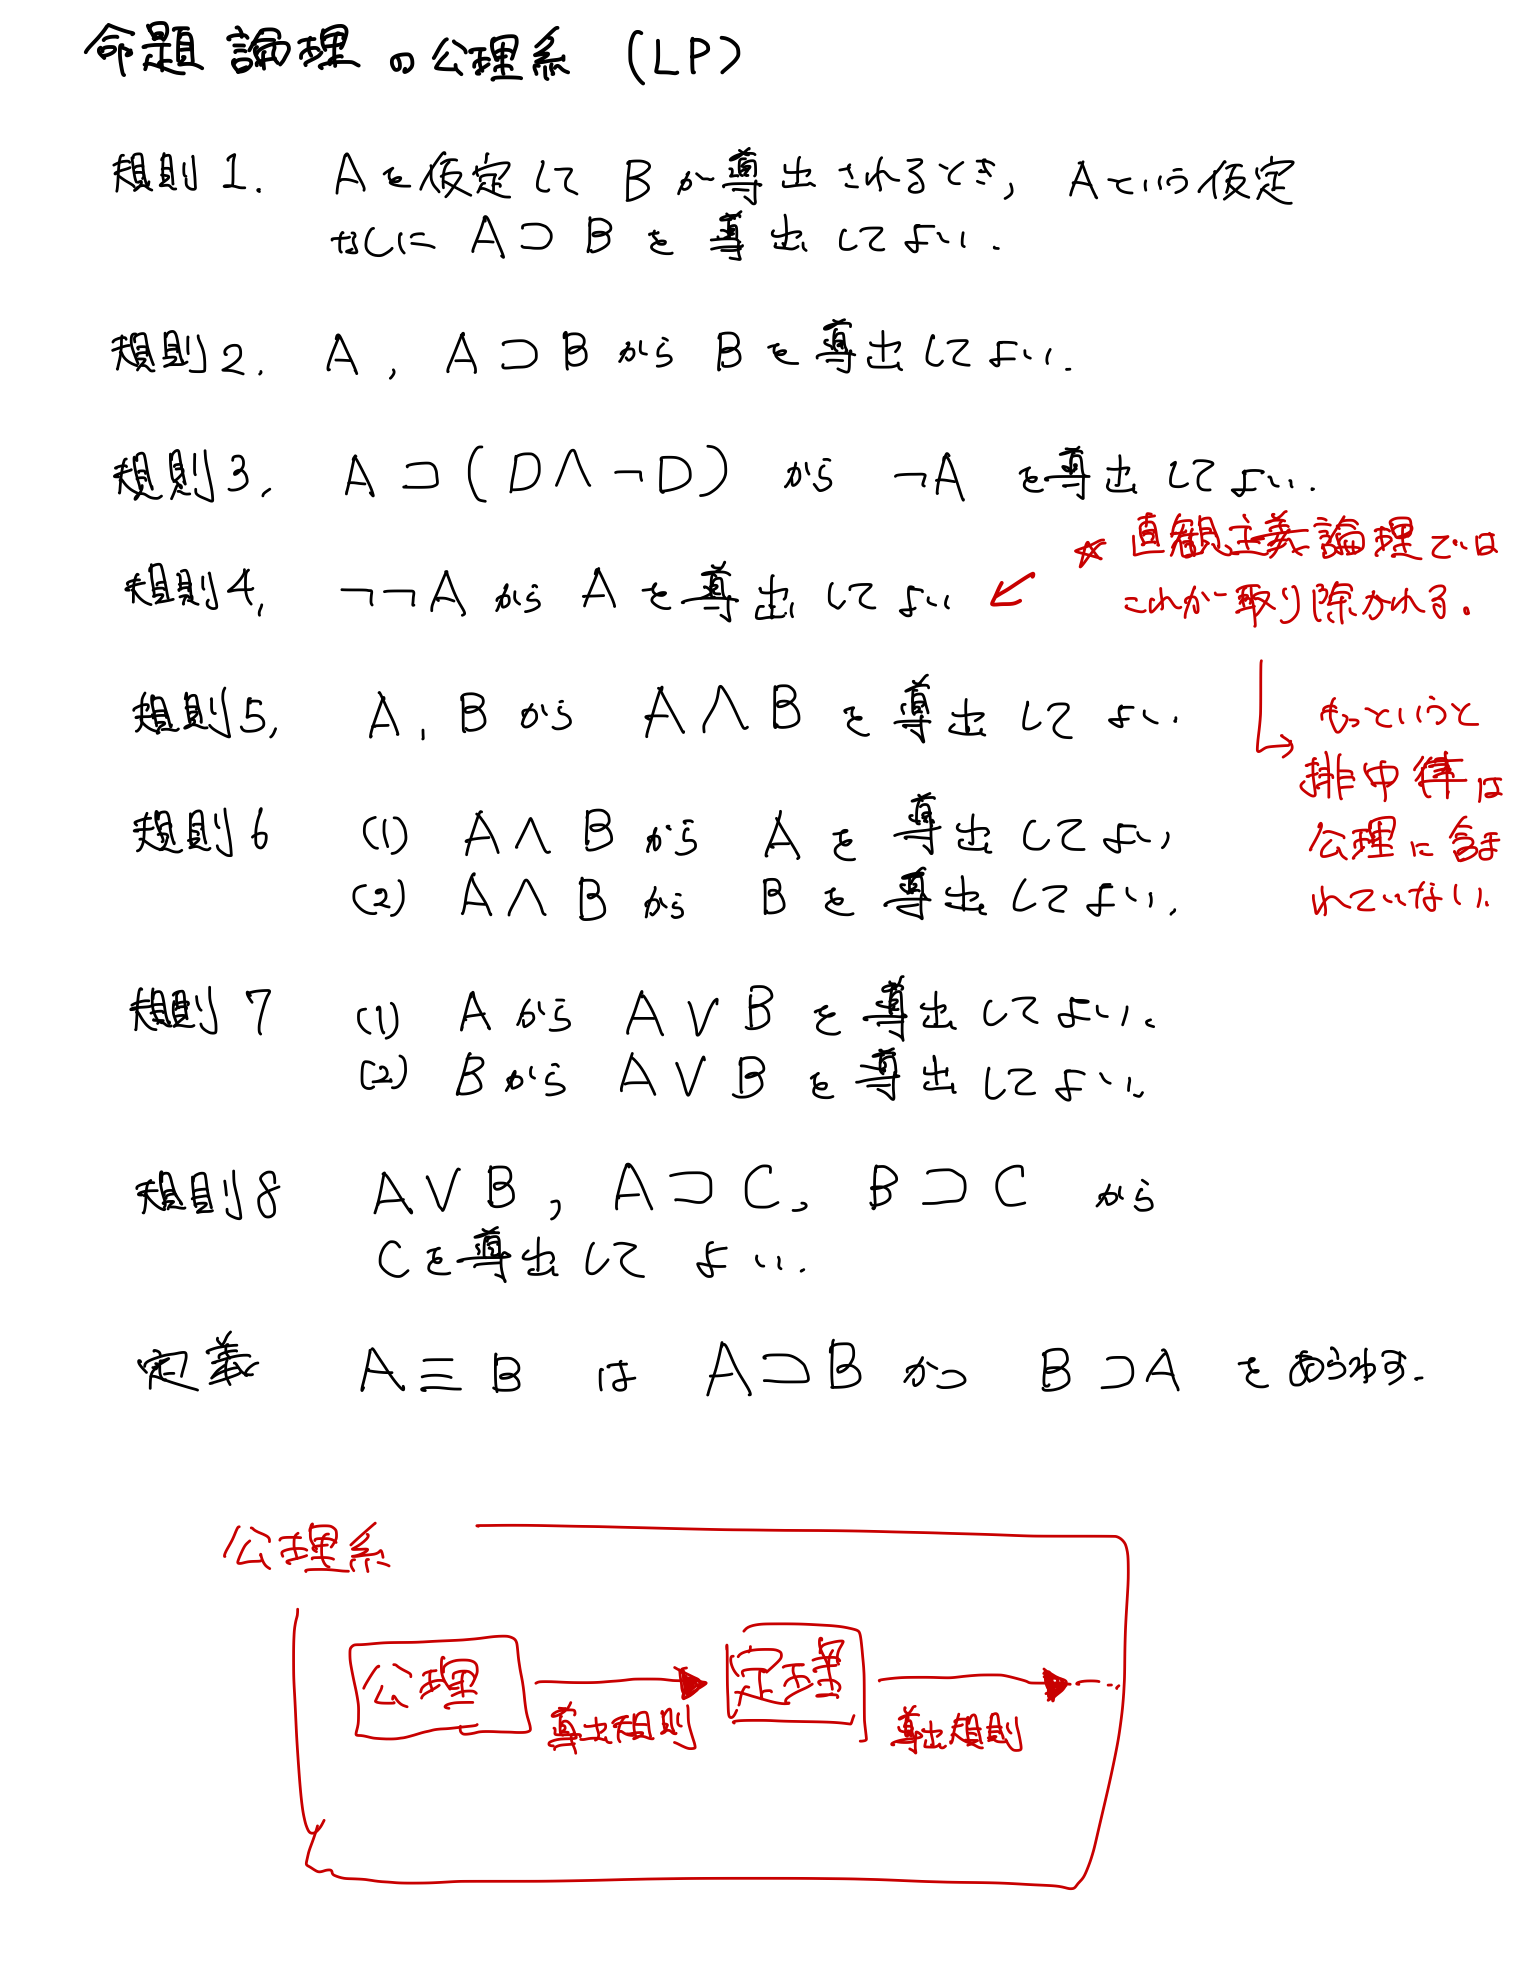 LP.png (337.5 kB)